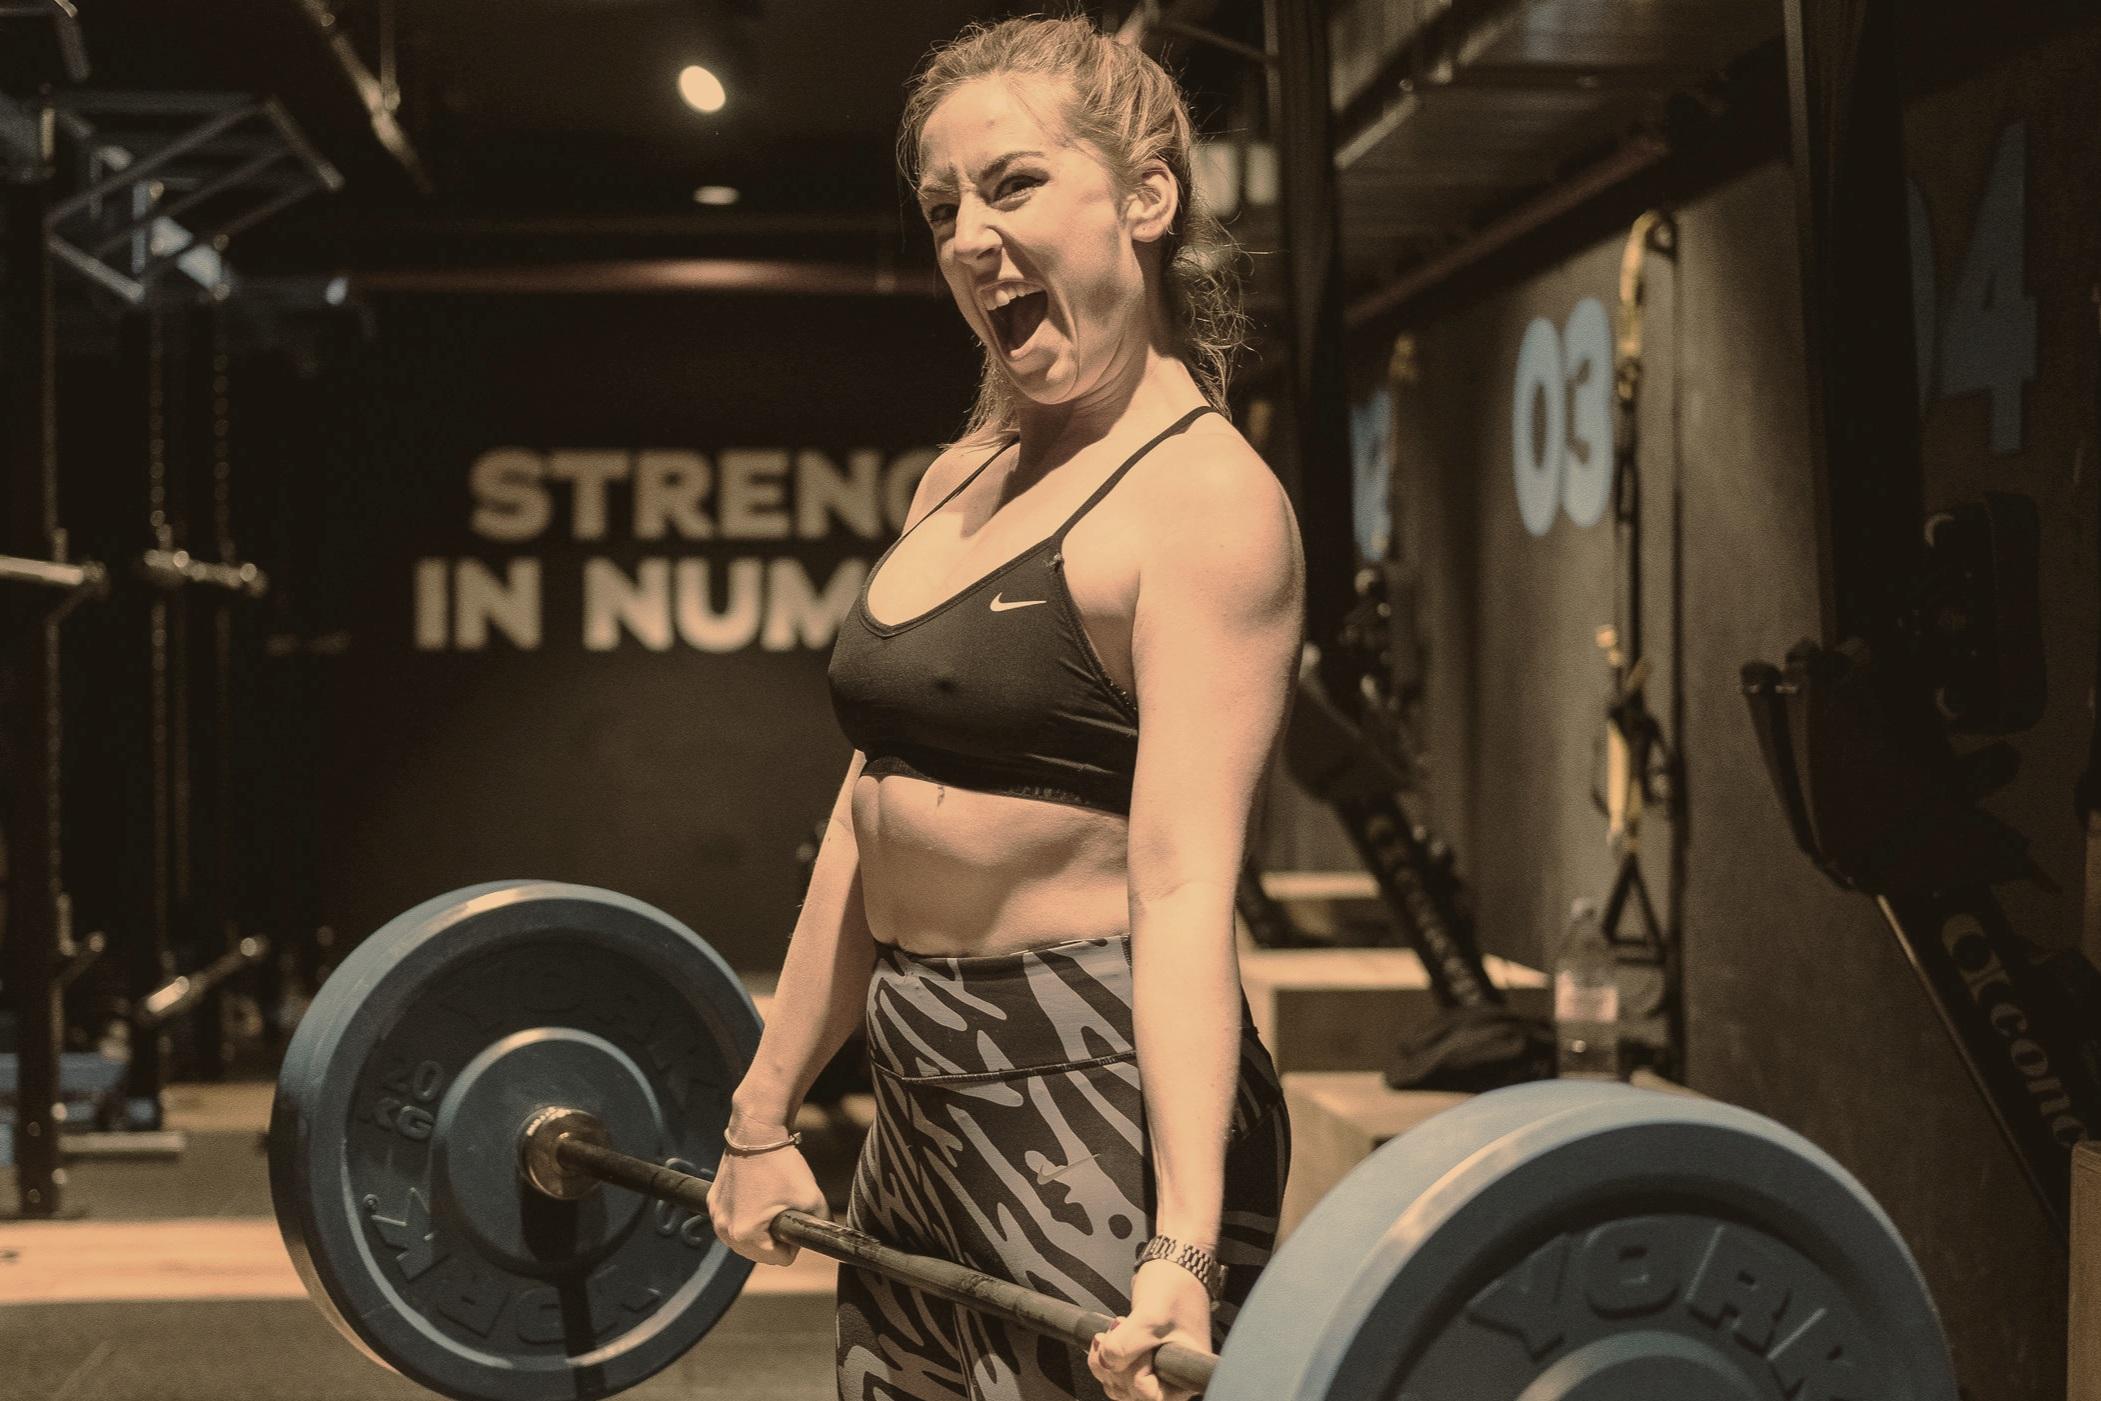 StrongHer+41.jpg